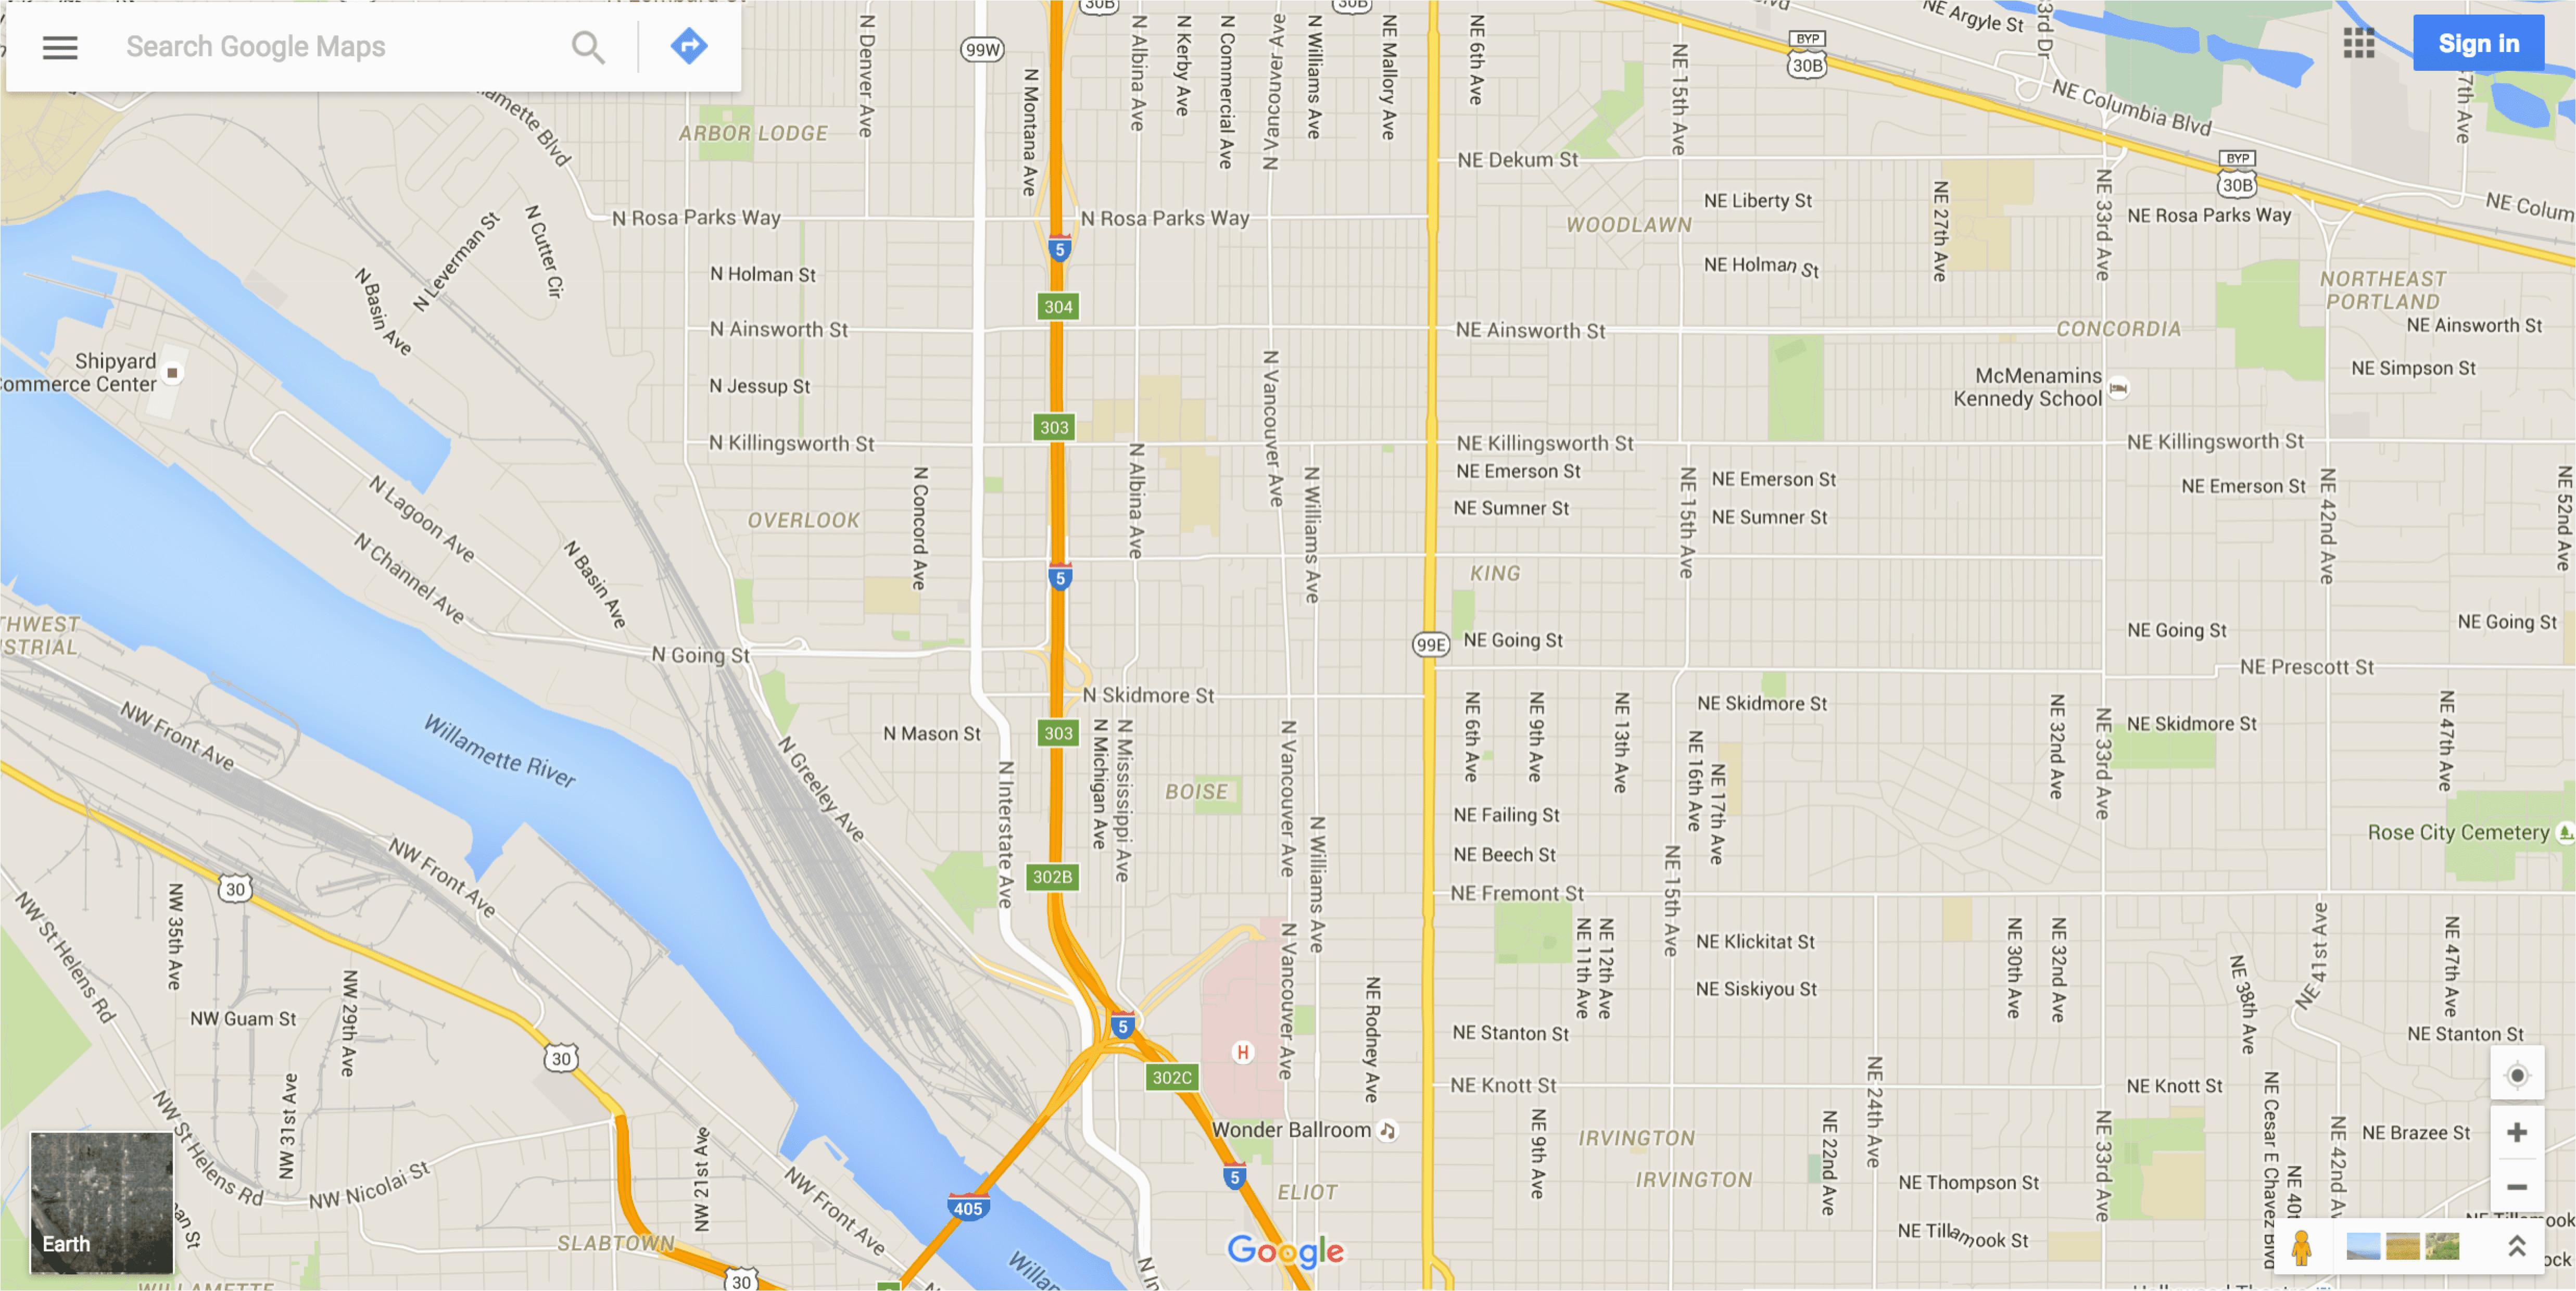 google maps barrie tario canada image google maps tario canada